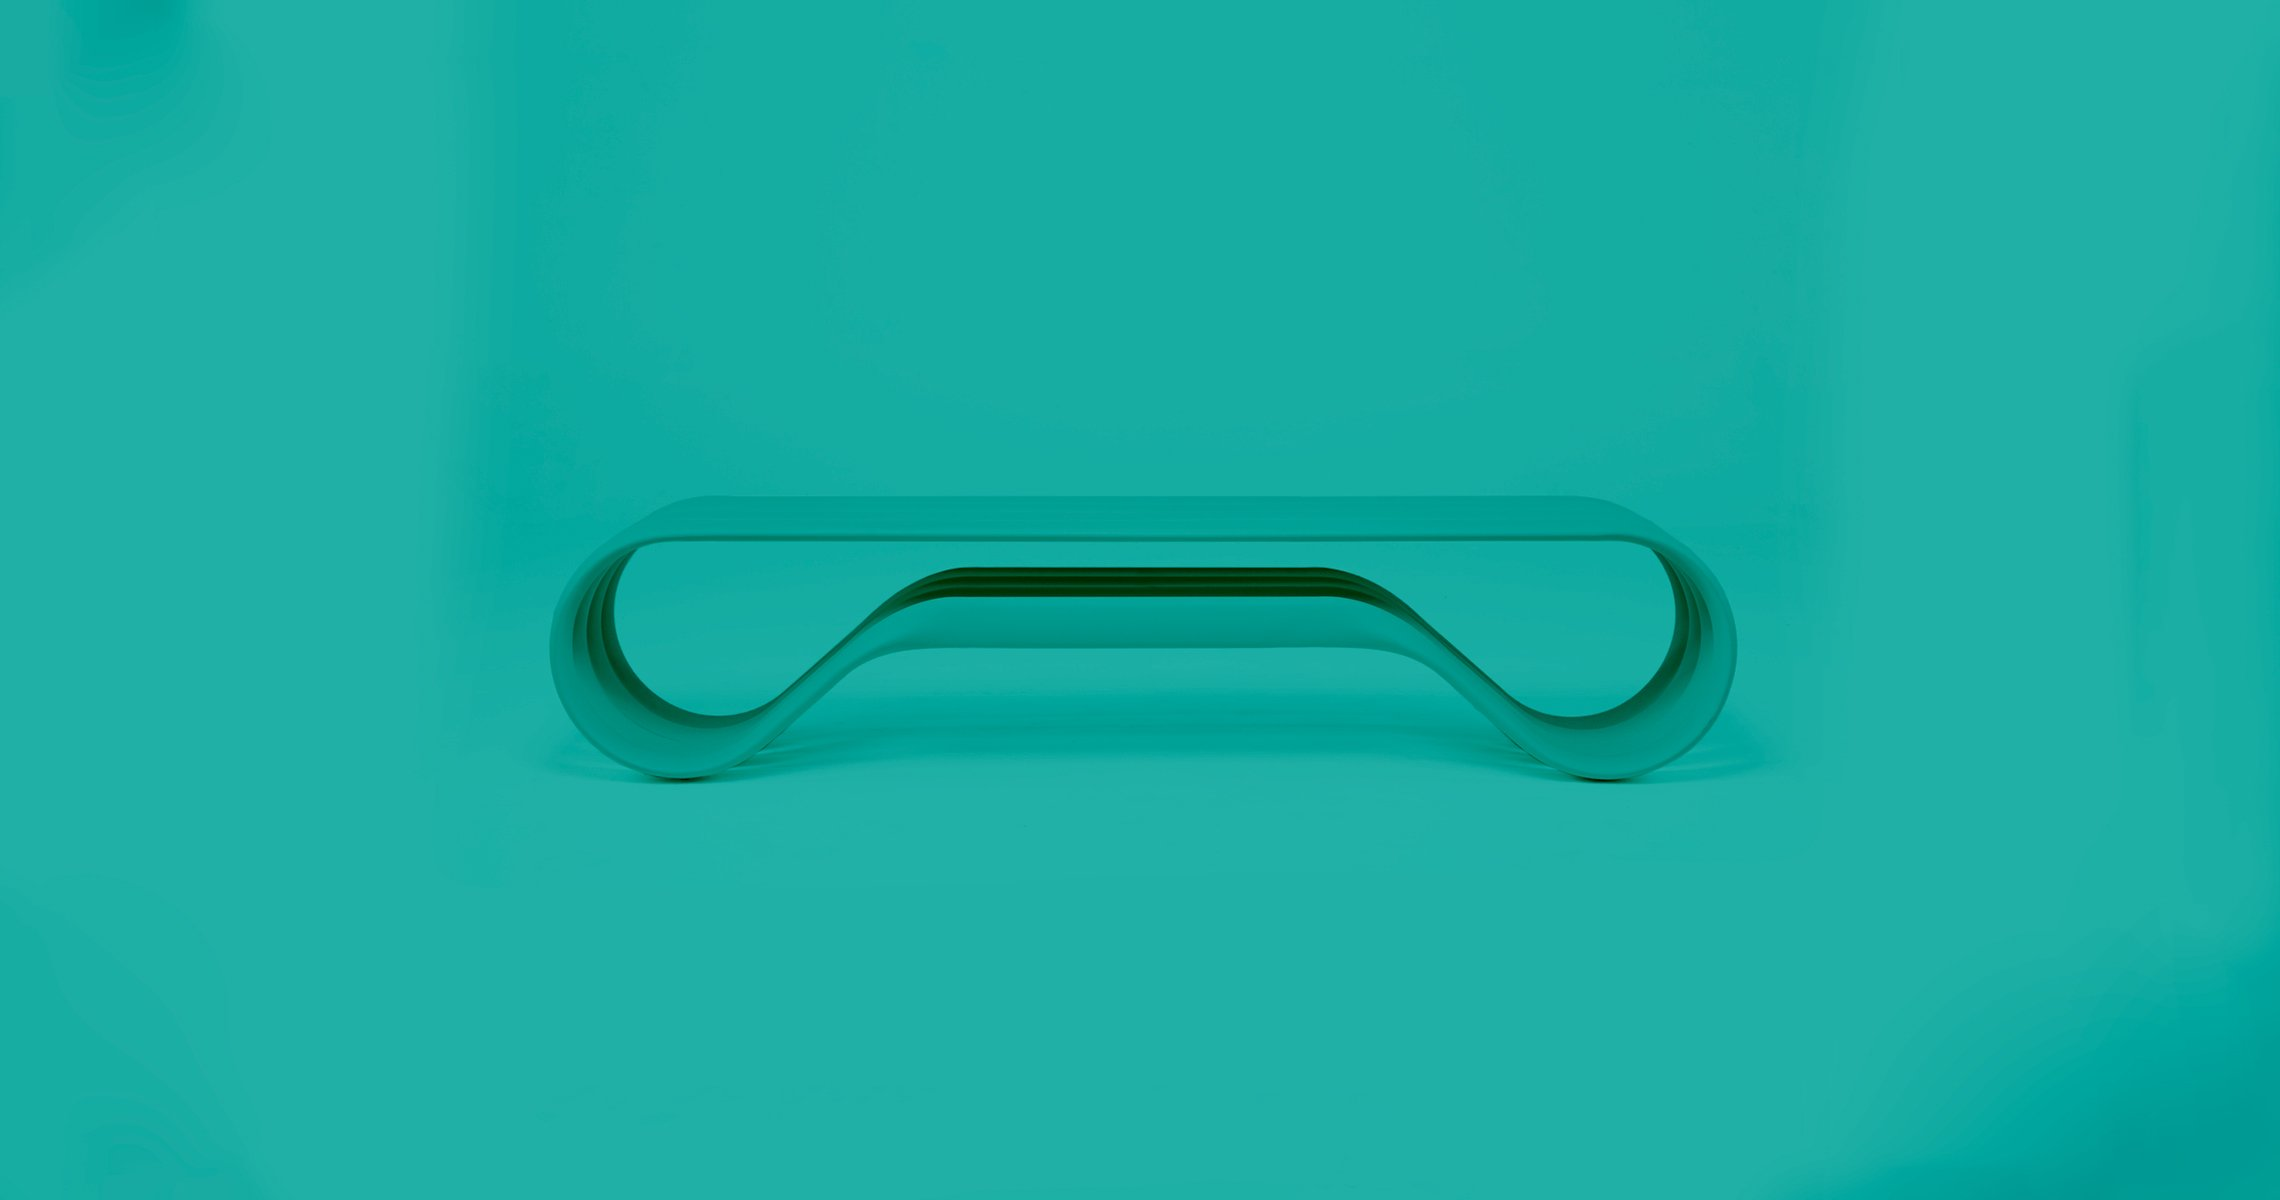 [Banco Infinito Colors] Fullbanner 3